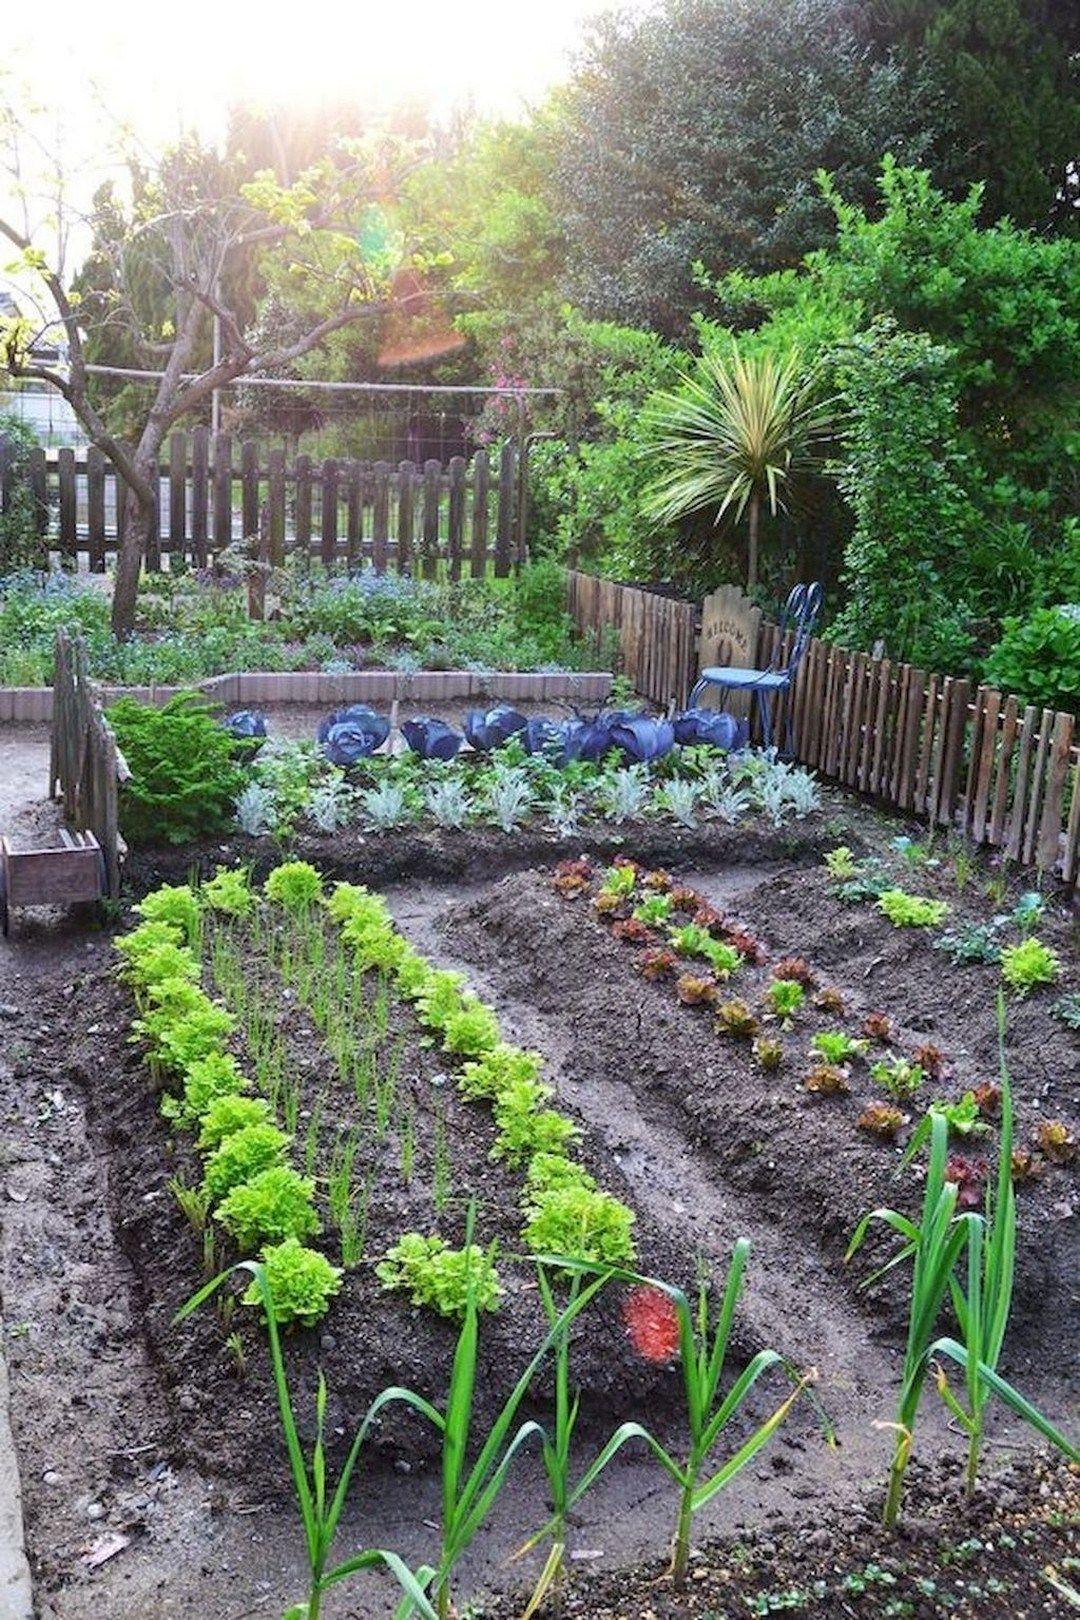 Vegetable Gardening Ideas That Will Create High Yields With Zero Effort Garden Layout Home Vegetable Garden Backyard Vegetable Gardens Backyard vegetable garden ideas pictures